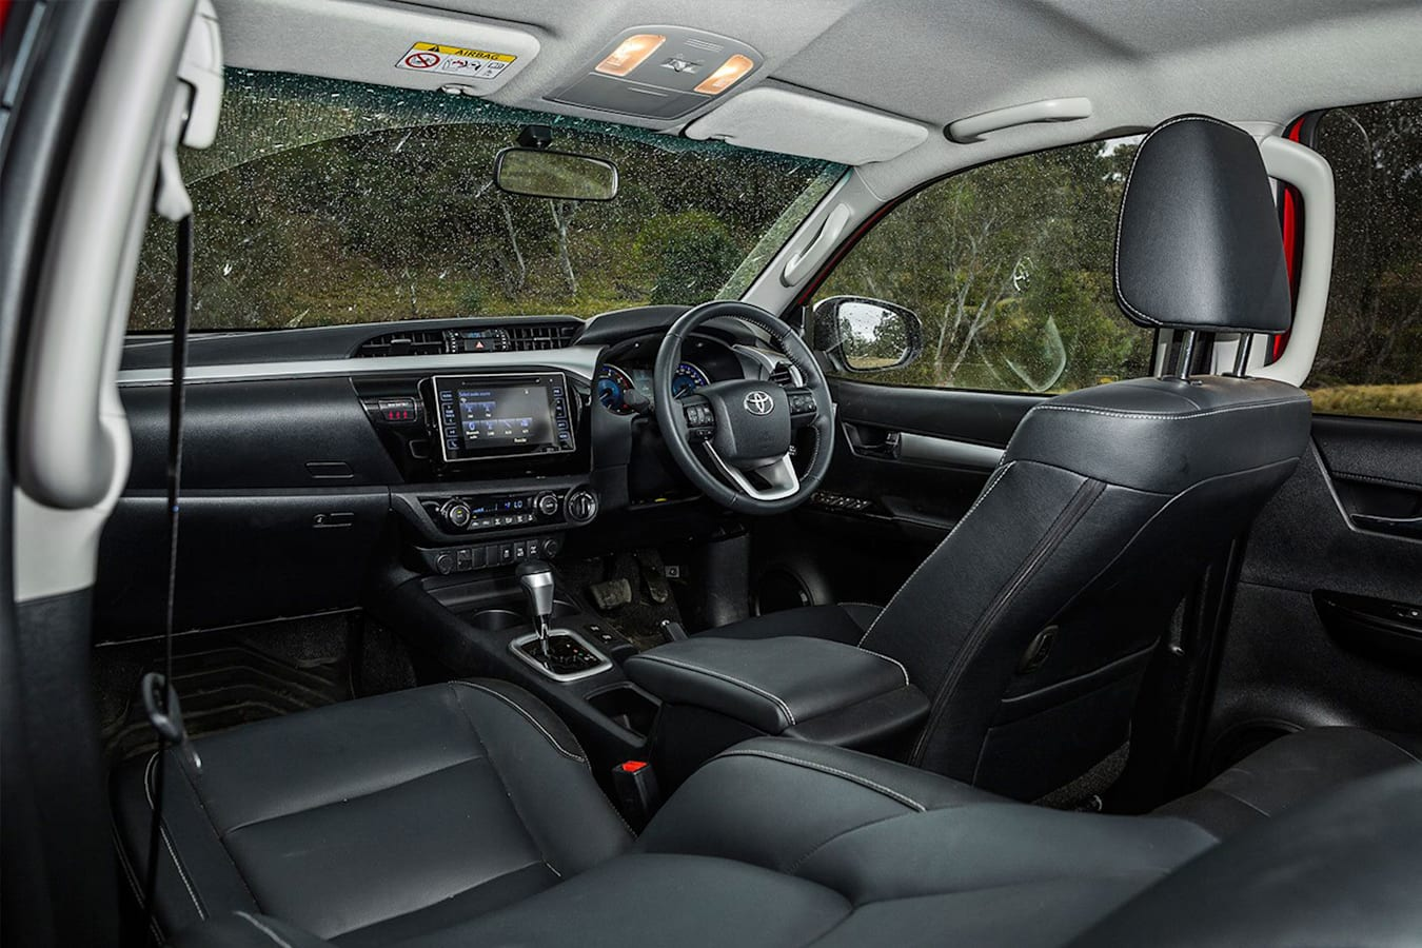 Toyota Hilux Interior Jpg